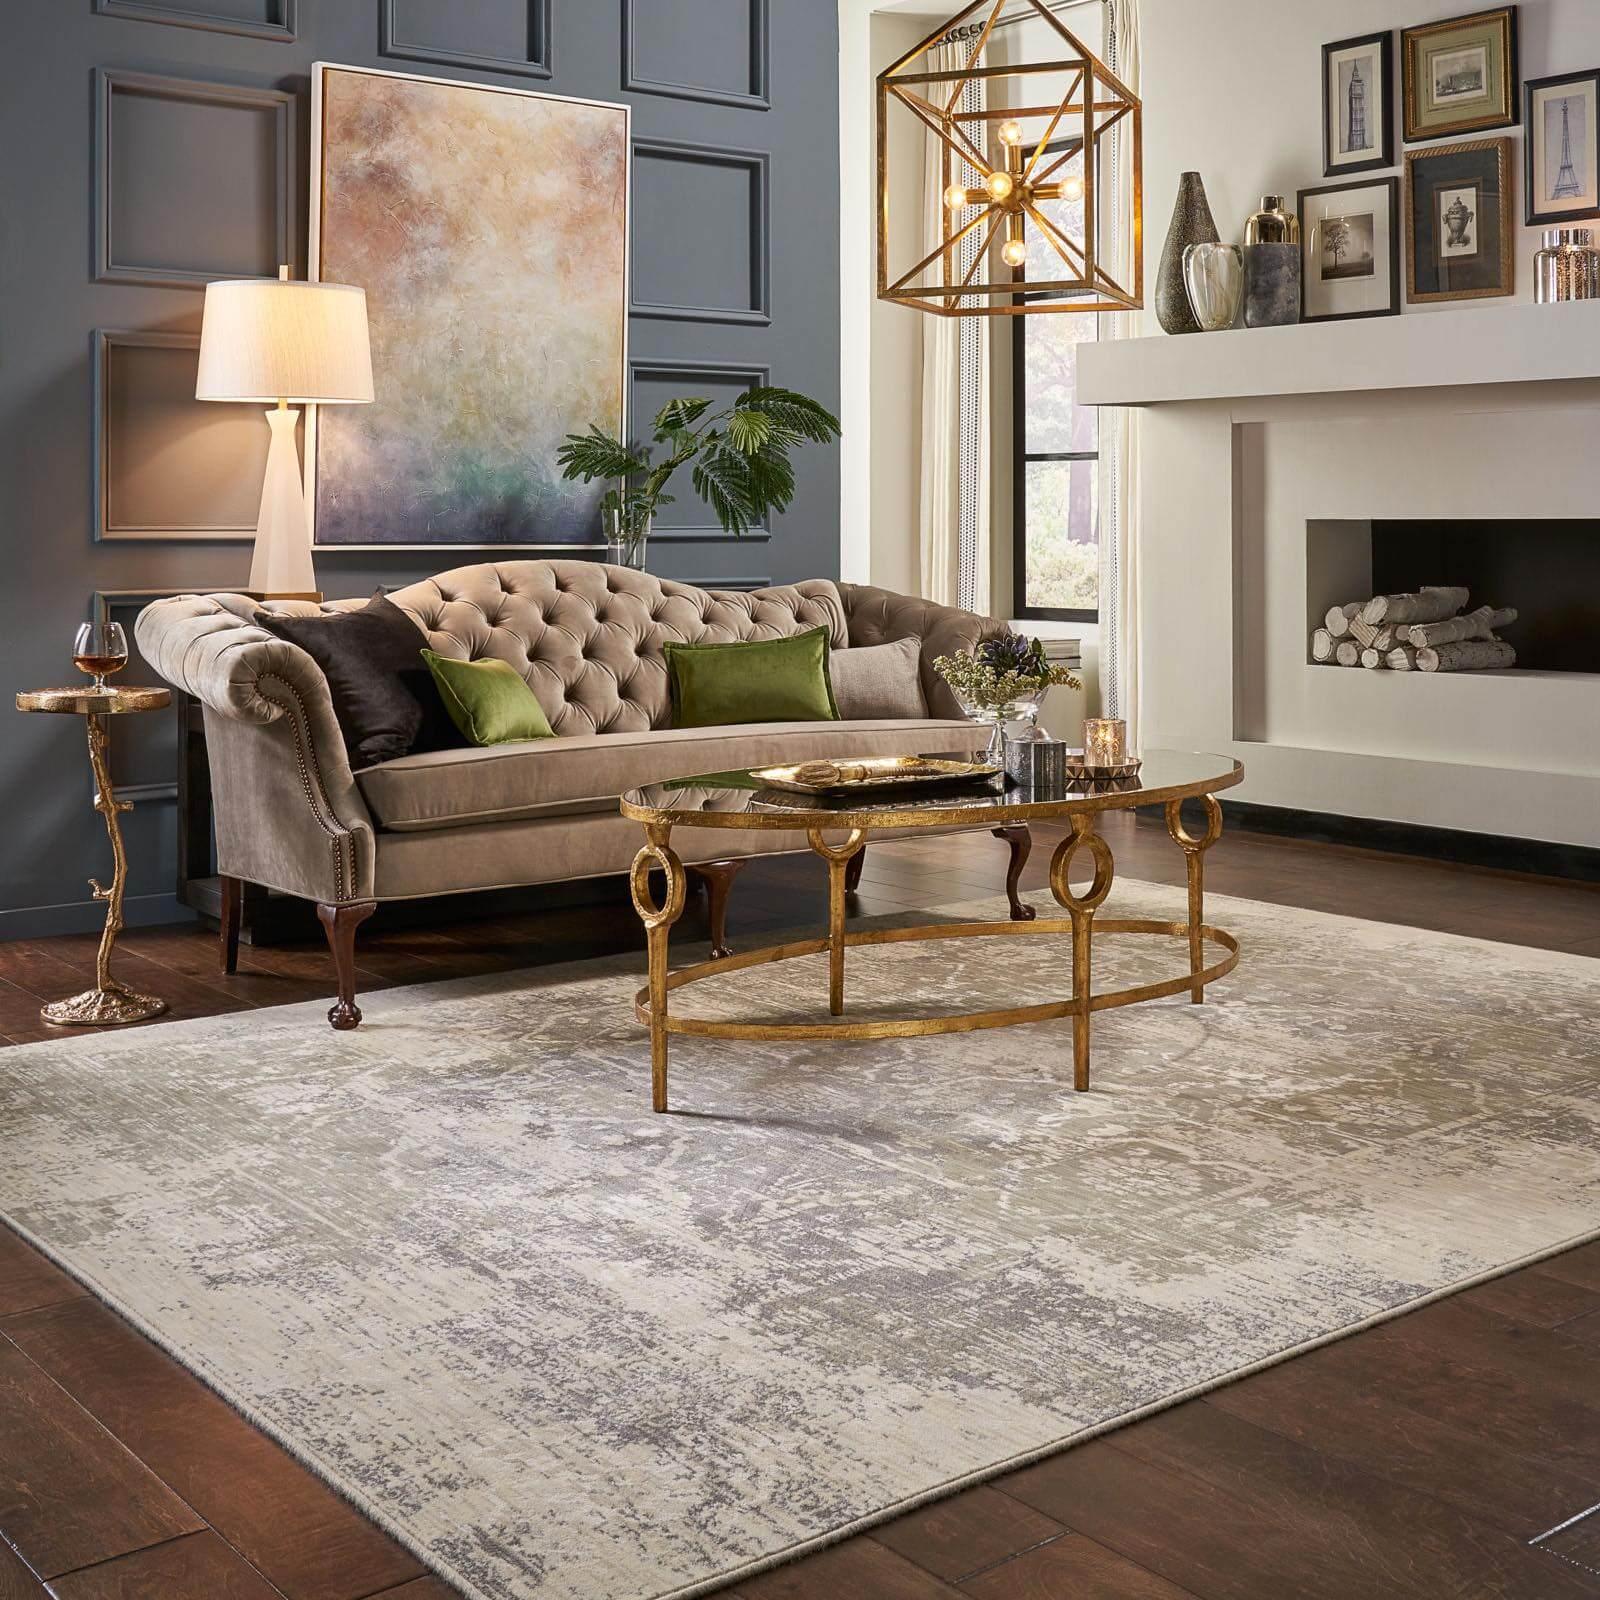 Karastan Area Rug | Great Floors